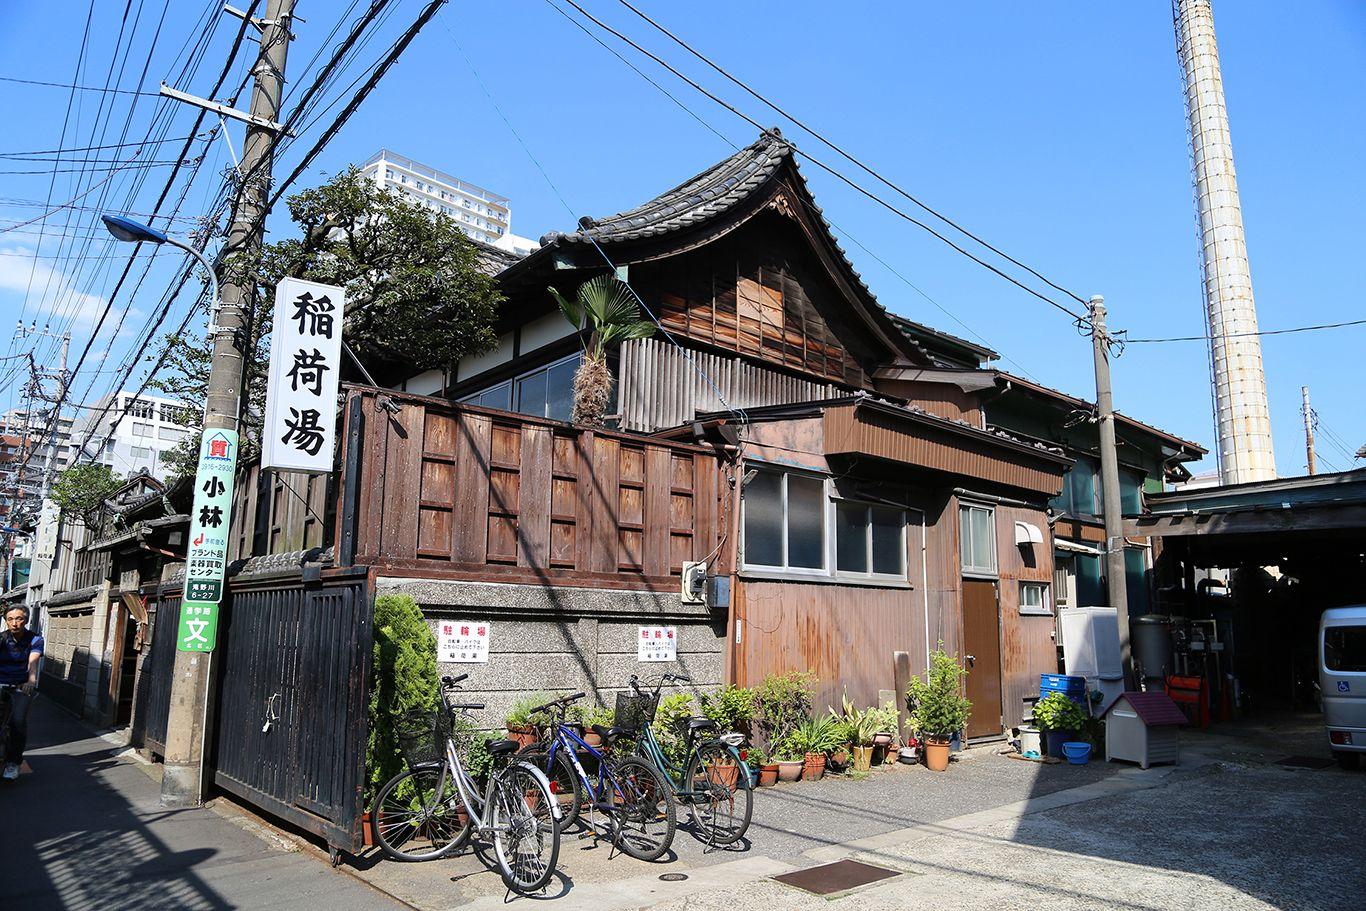 The Inari-yu bathhouse in Tokyo